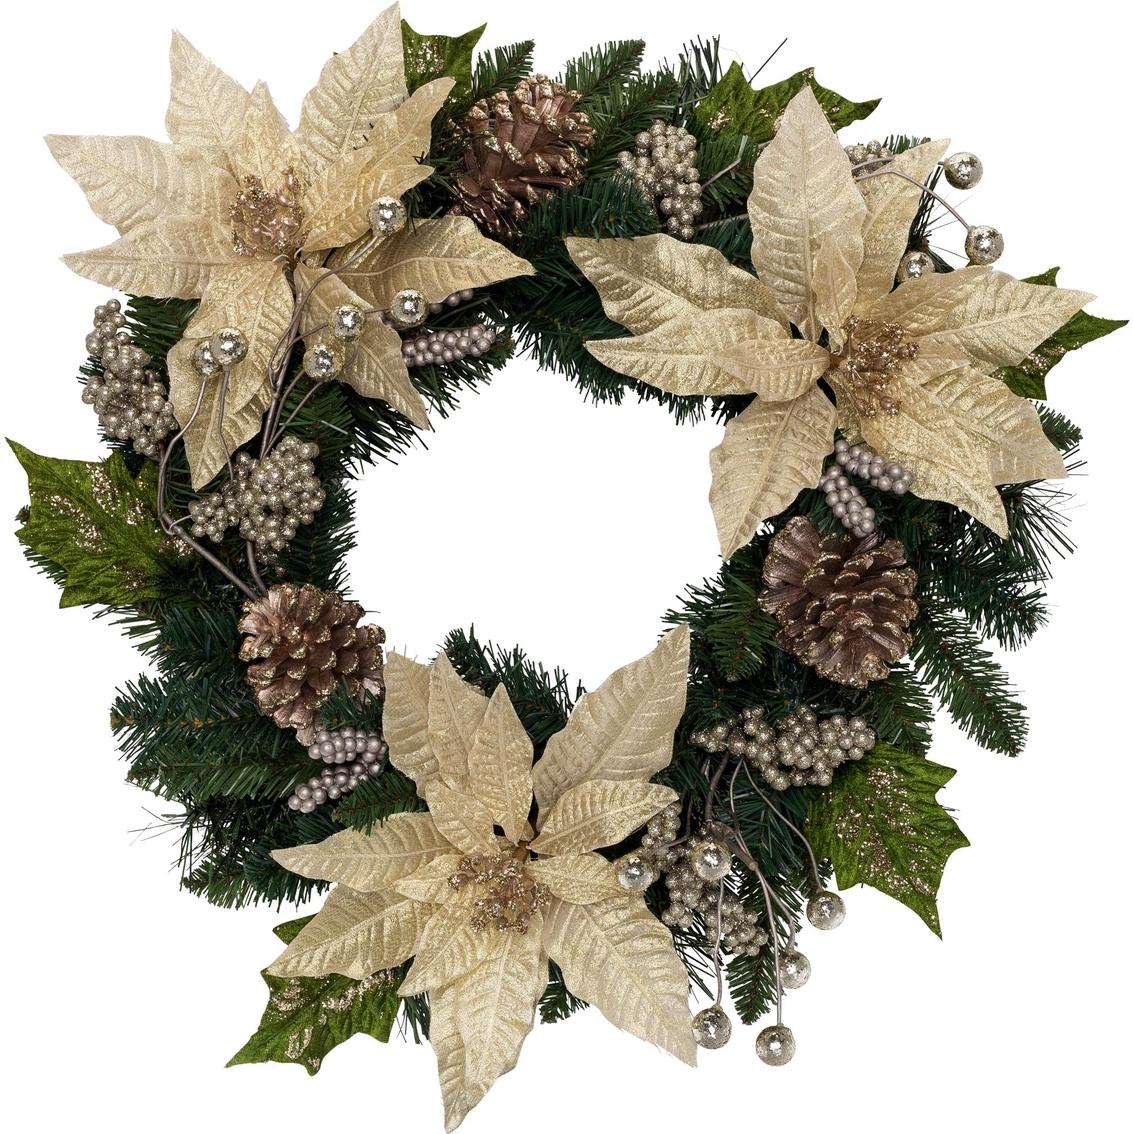 24 Inch Poinsettia Wreath Outdoor Decor Shop The Exchange